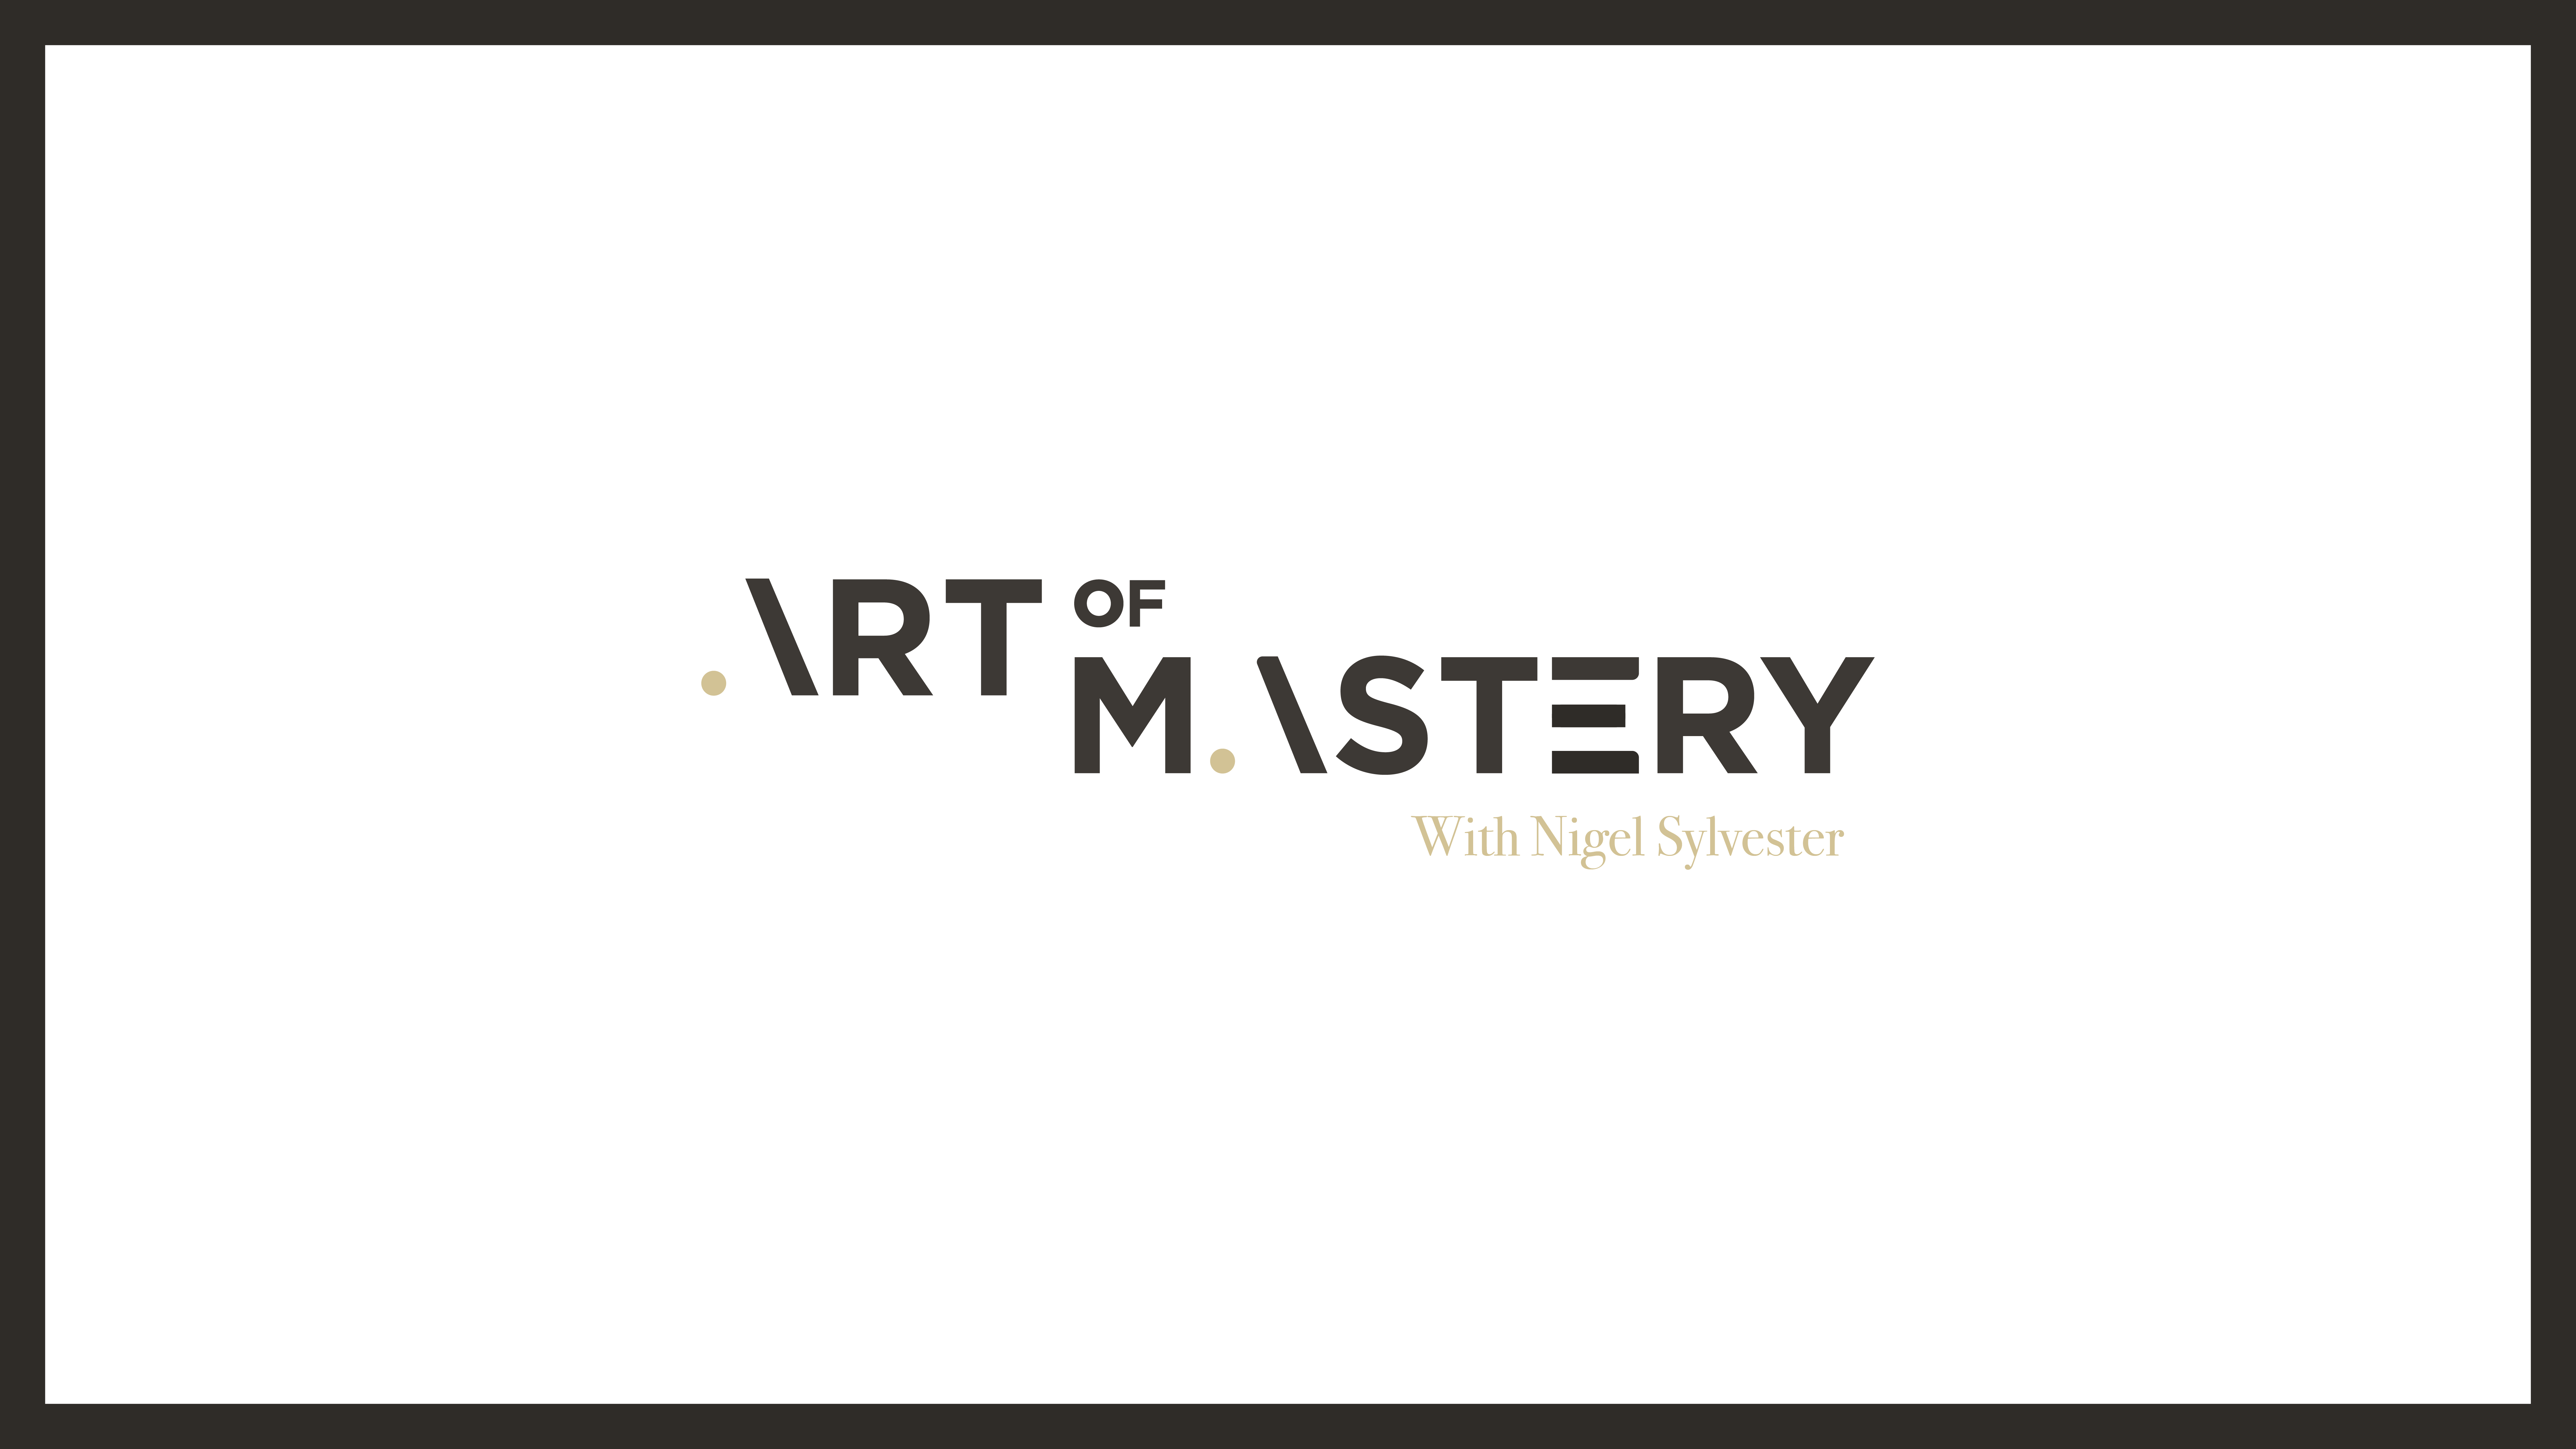 Art Of Mastery_Hennessey-01